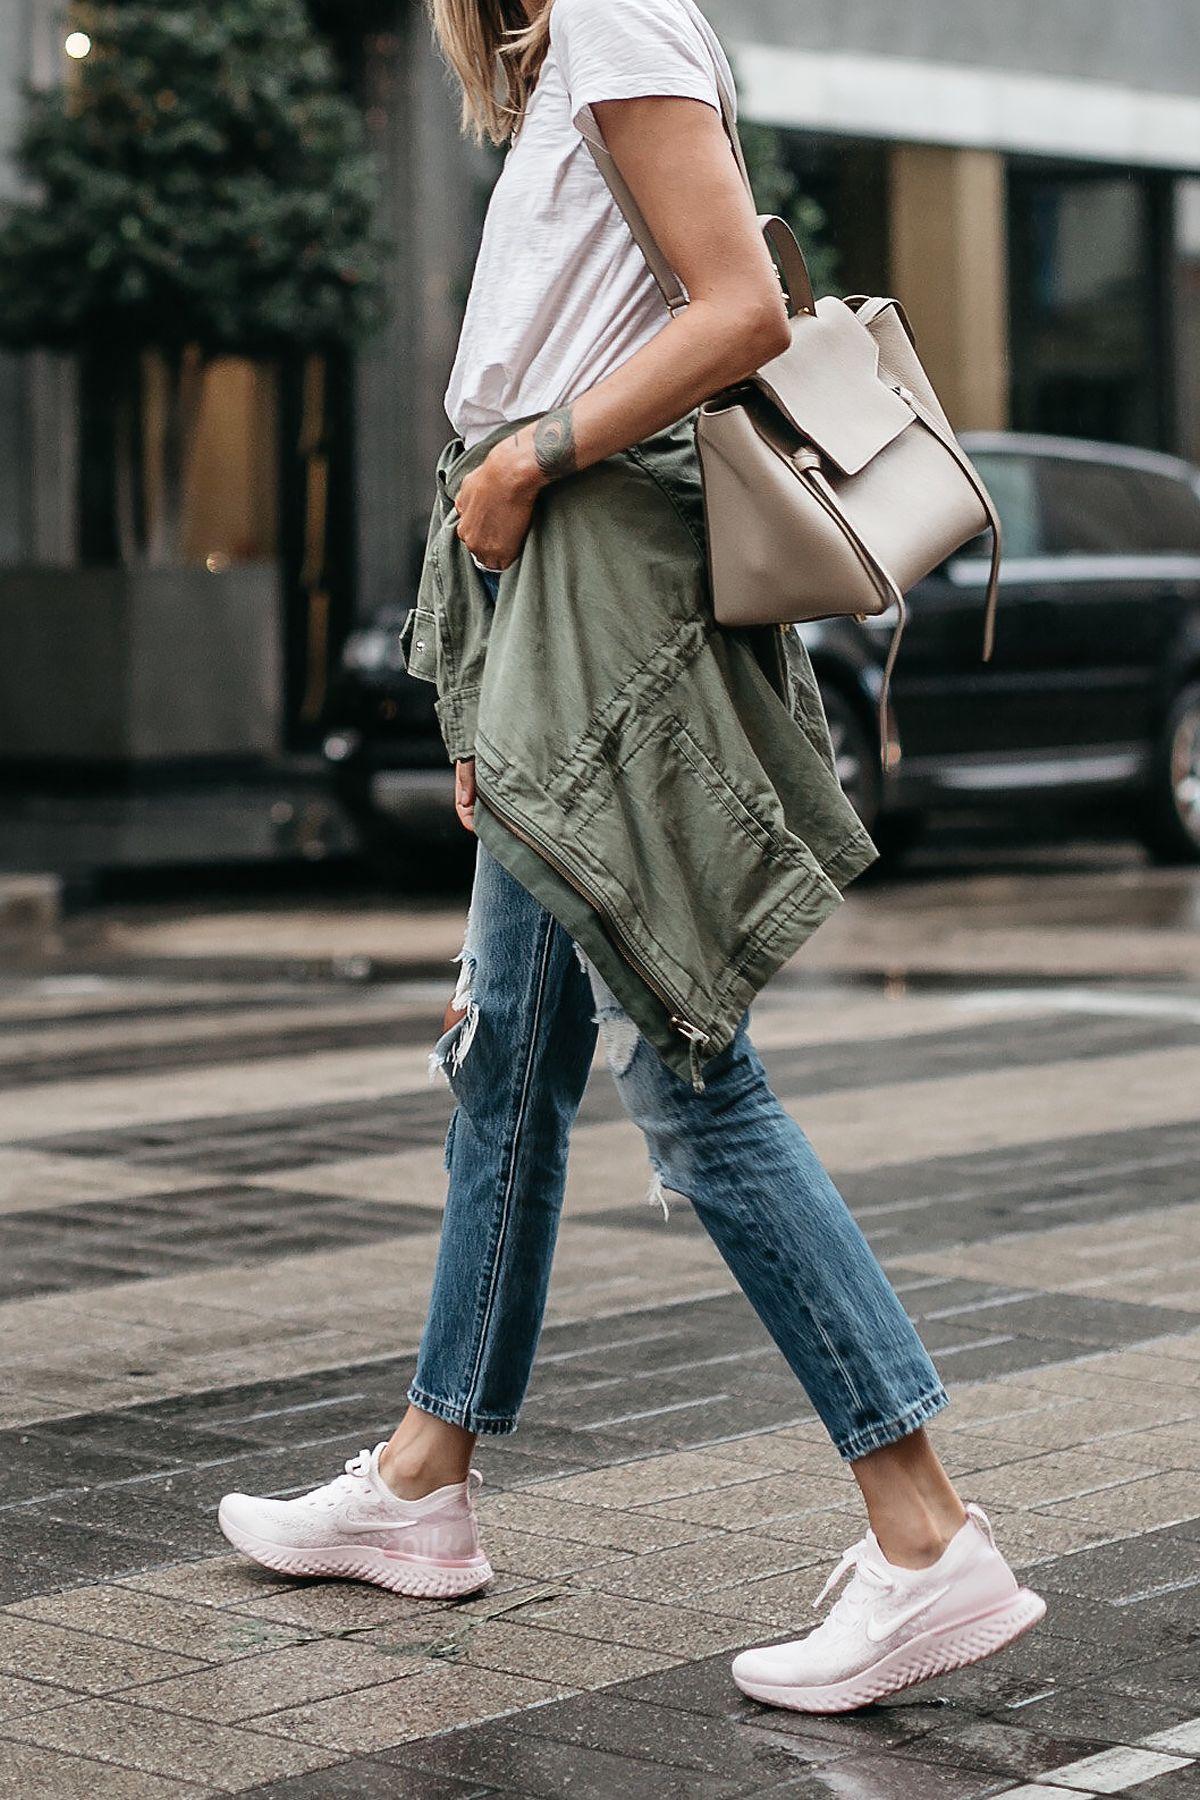 6ae282959e2 ... React Running Shoe White Tshirt Ripped Denim Jeans Green Utility Jacket  Celine Mini Belt Bag Fashion Jackson Dallas Blogger Fashion Blogger Street  Style